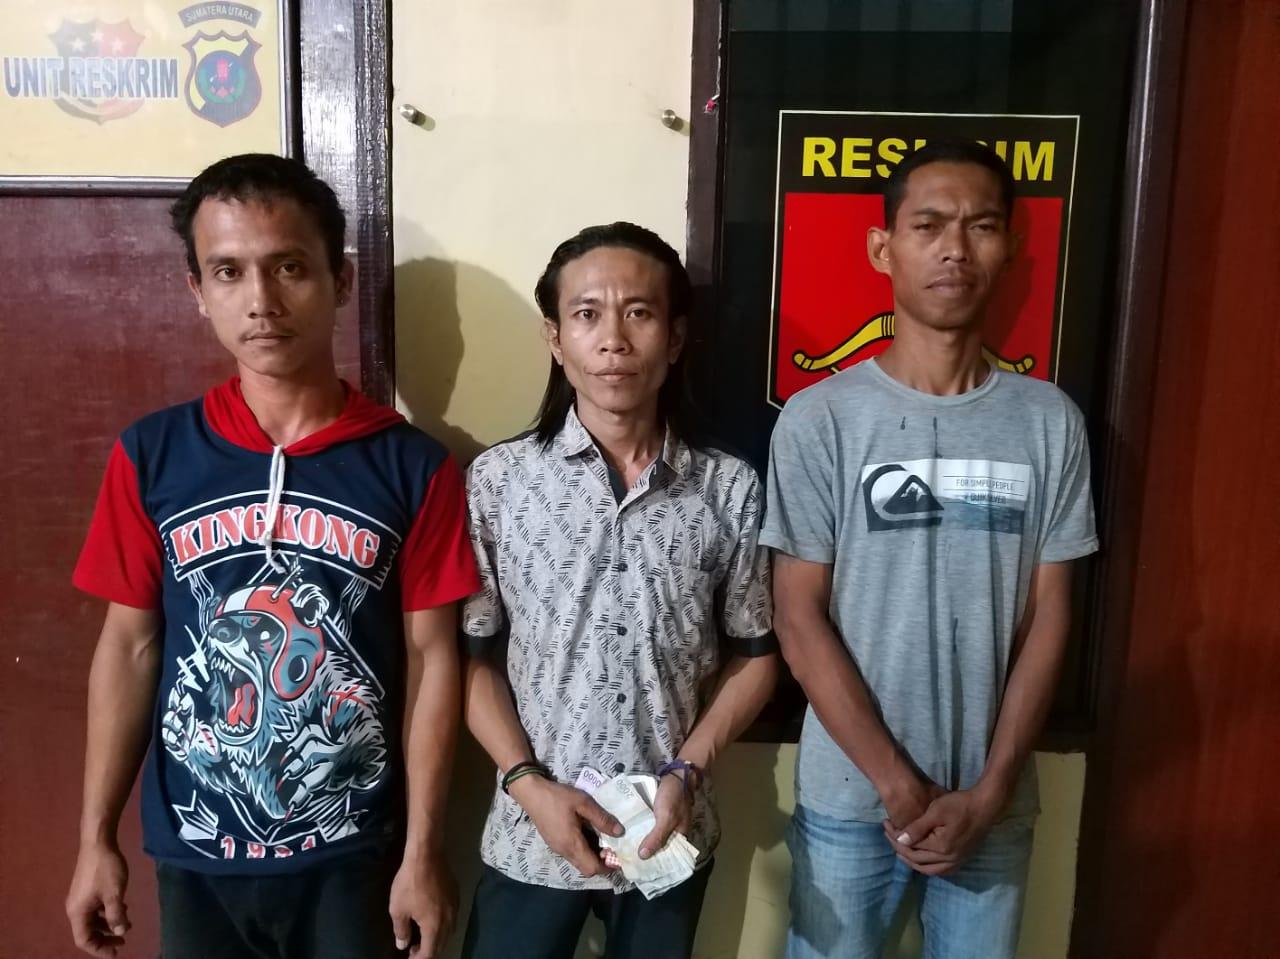 Polsek Tanjung Morawa, Amankan 3 Pelaku Pungli